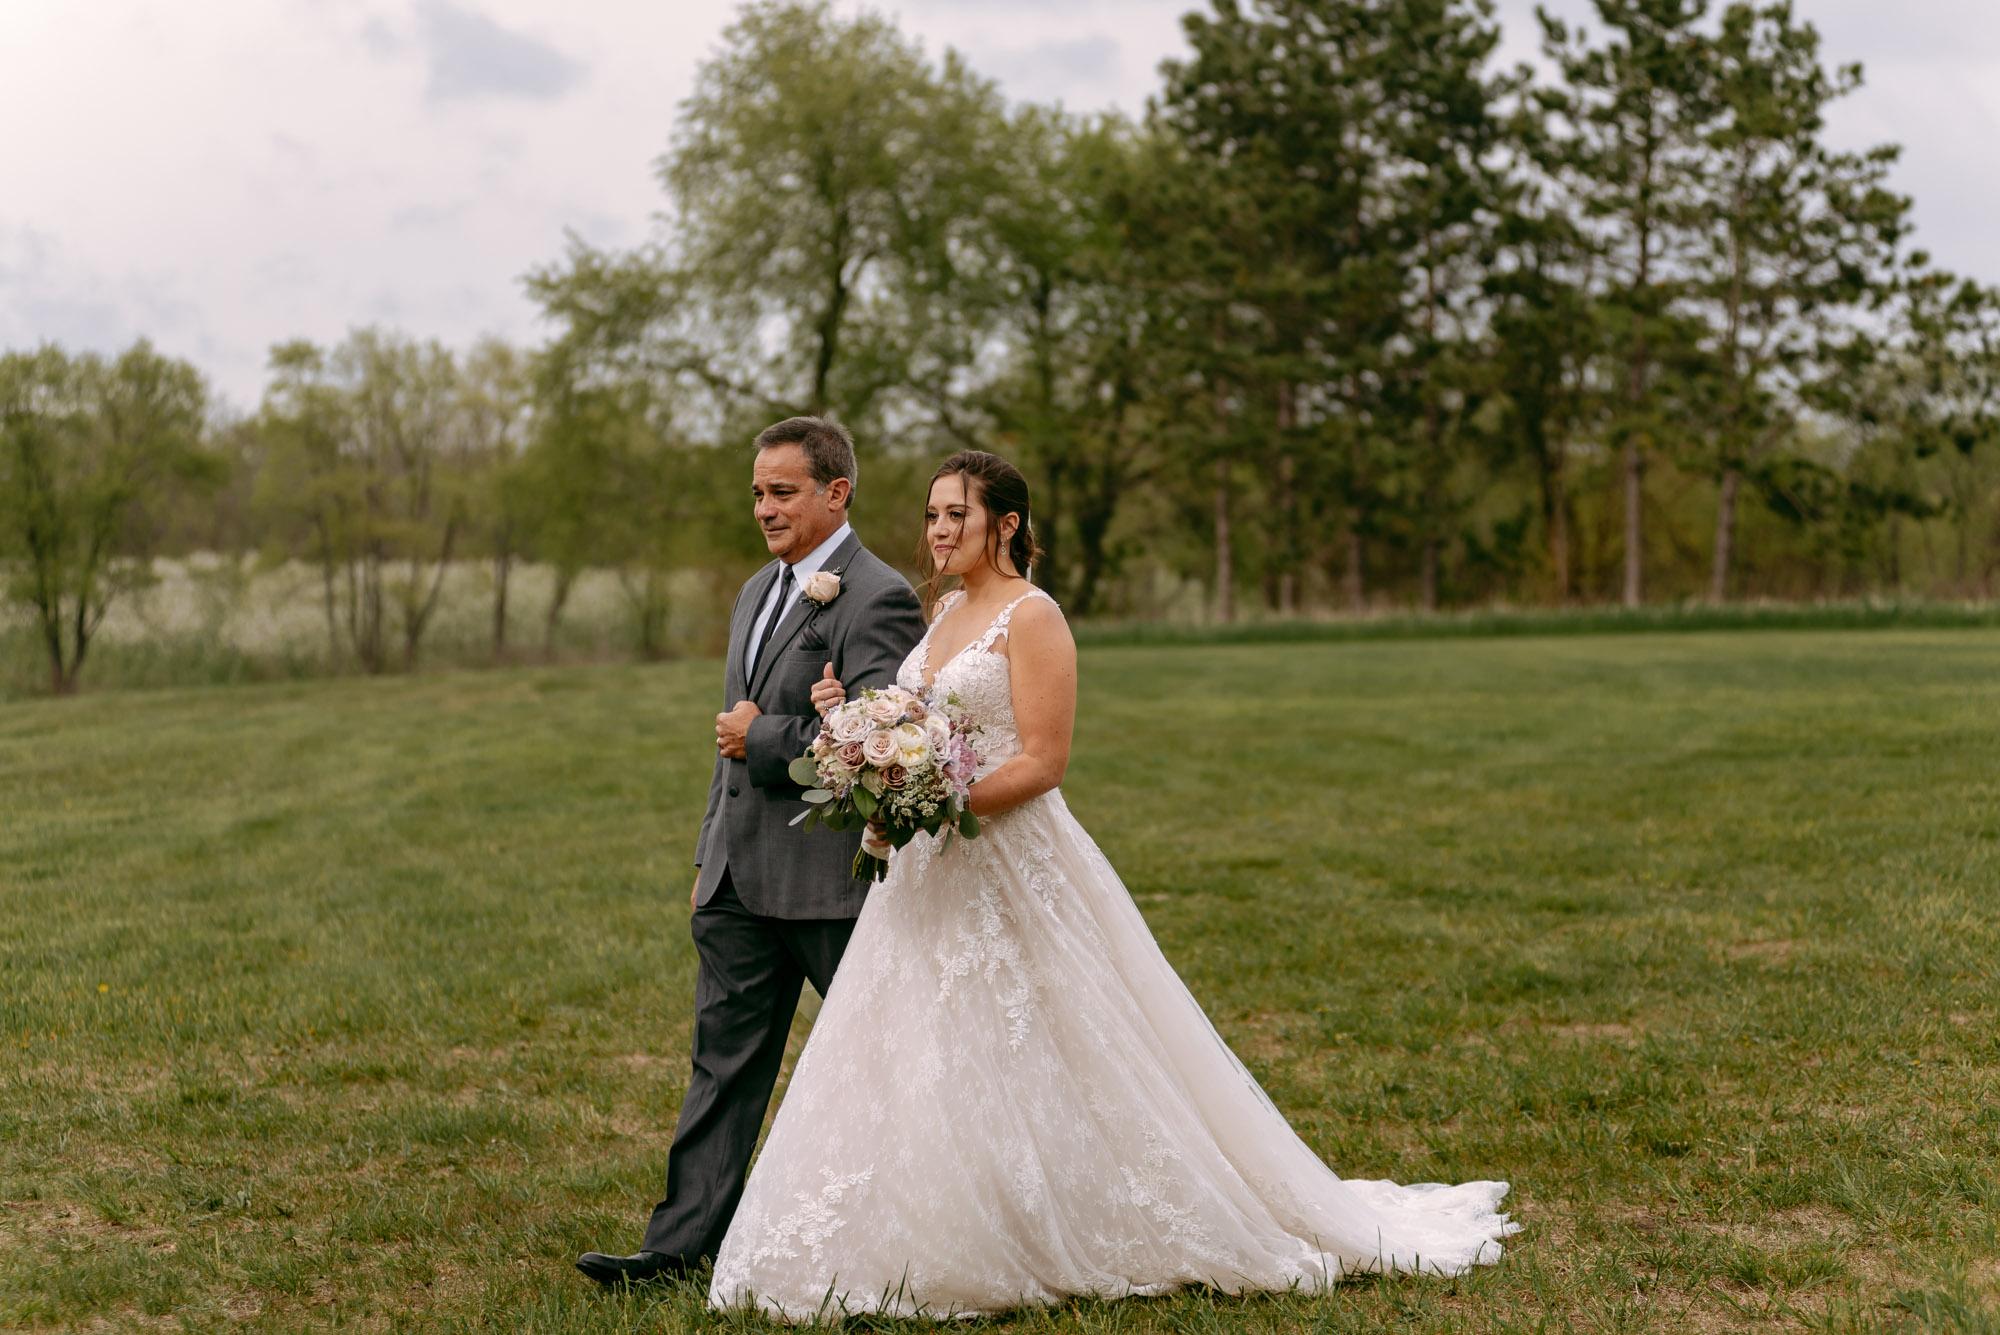 orchard-farms-pavillion-wedding-rockton-IL-wedding-photographers-262.jpg